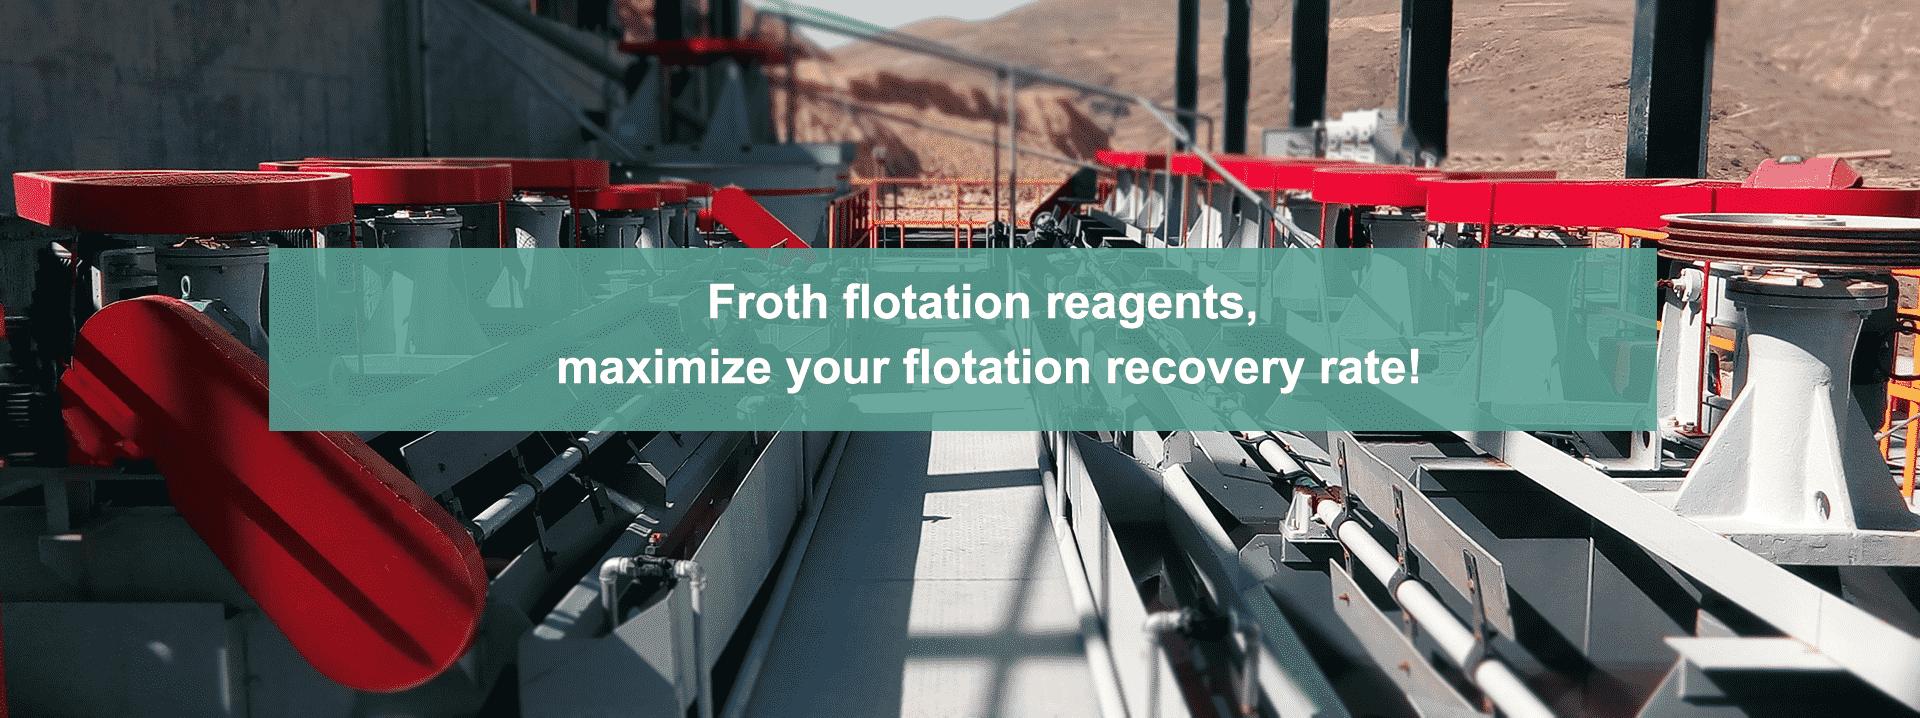 froth flotation reagent